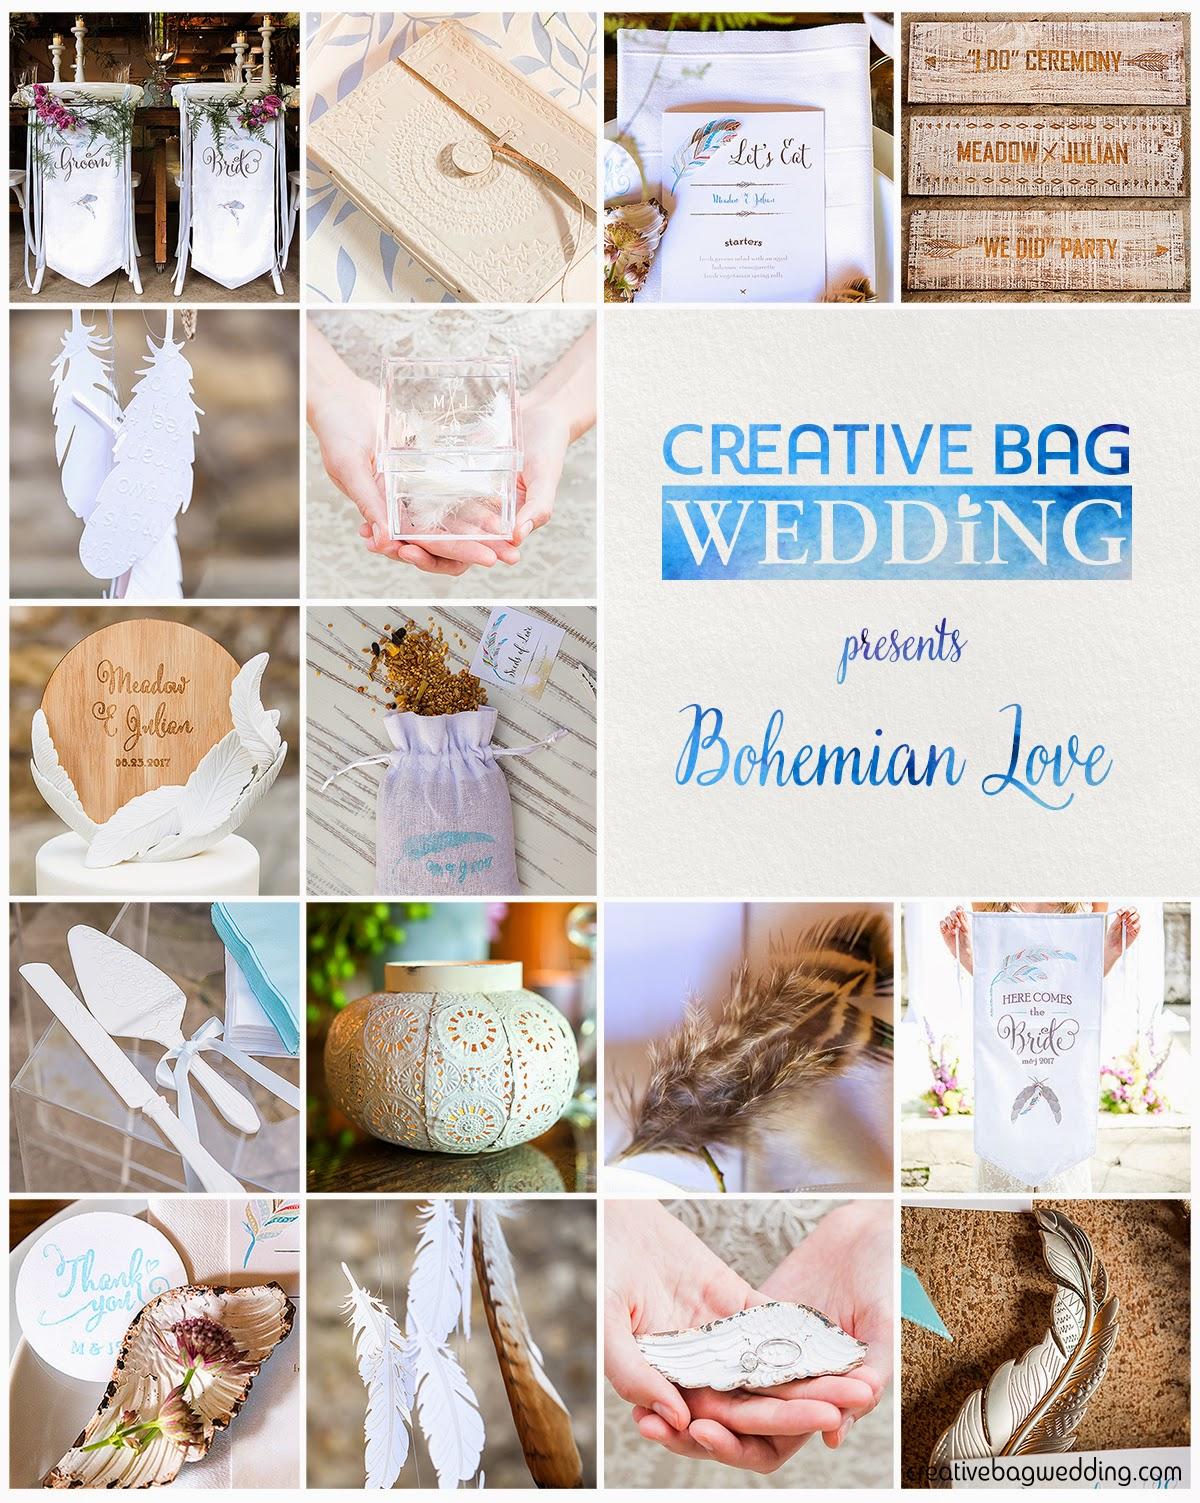 bohemian love mood board | Creative Bag Wedding